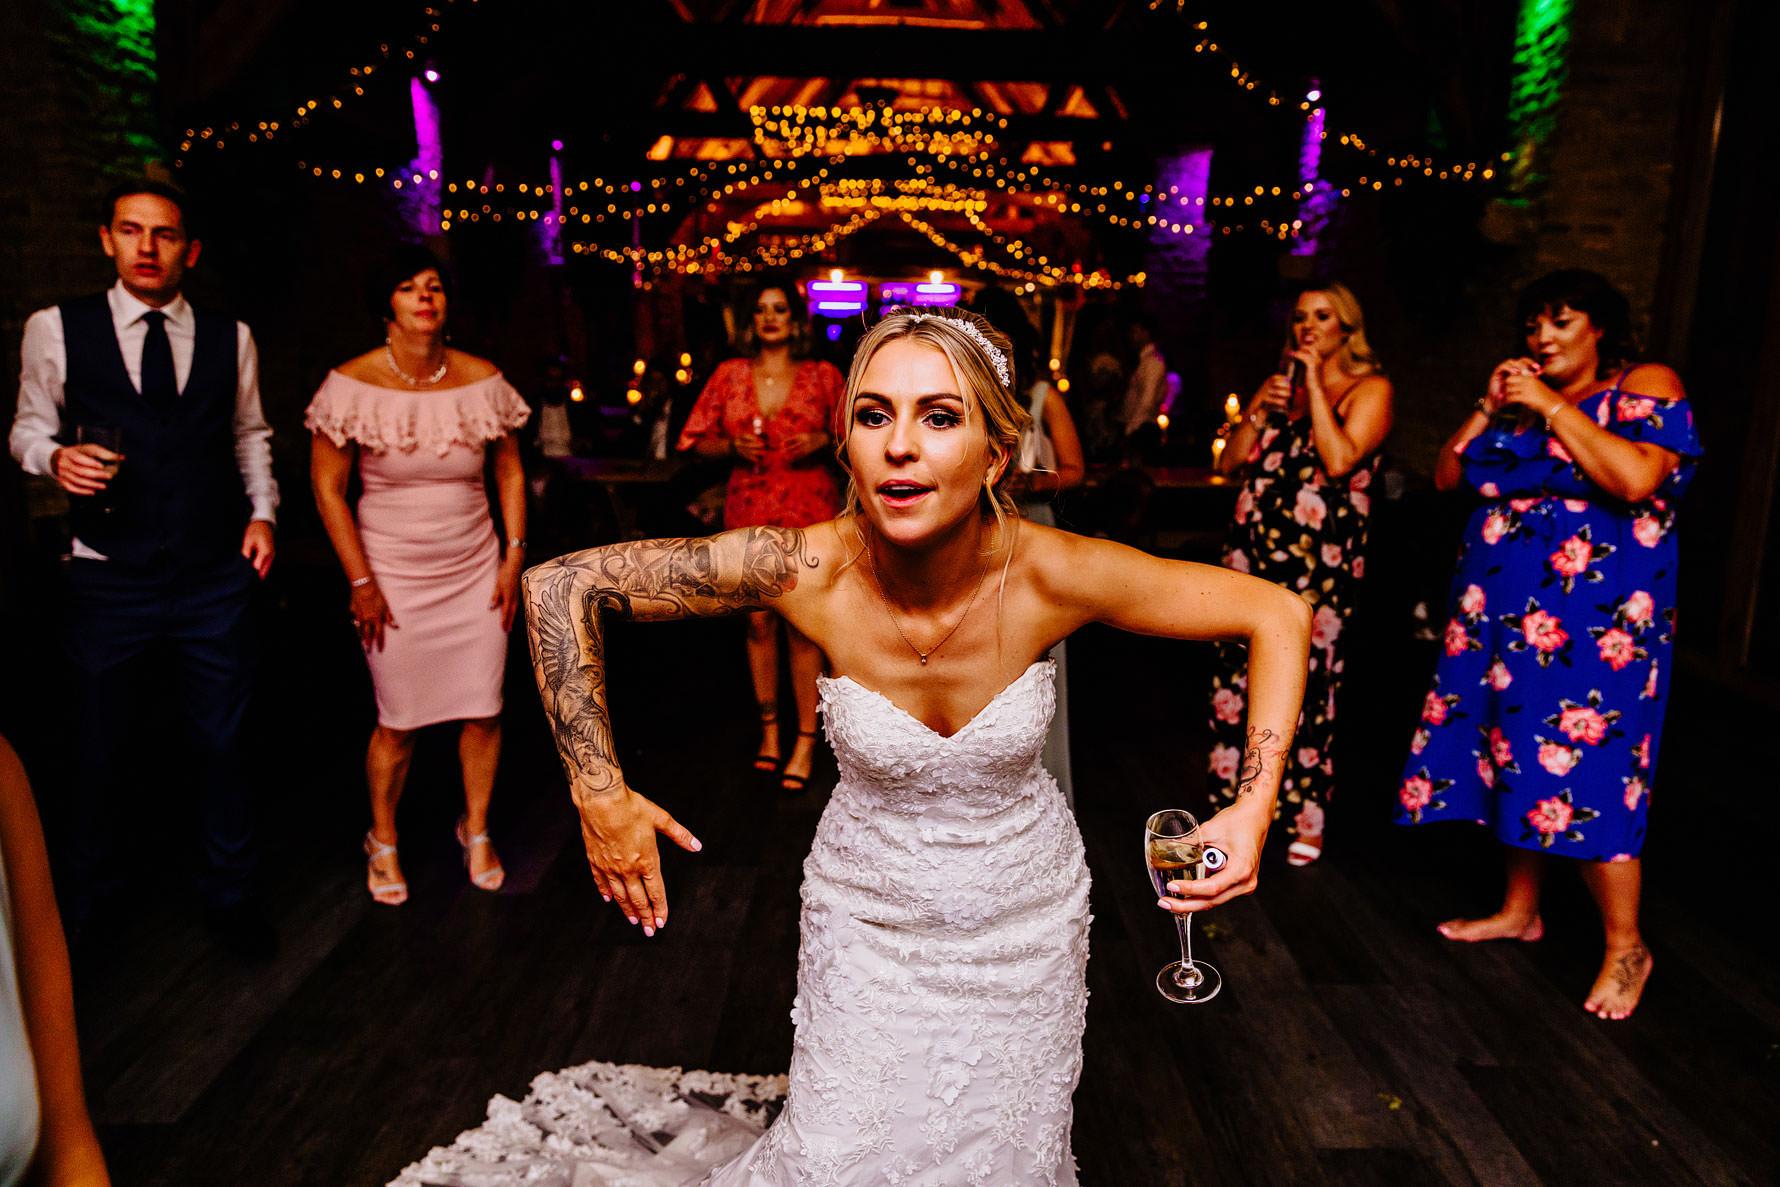 a funny photo of a bride!